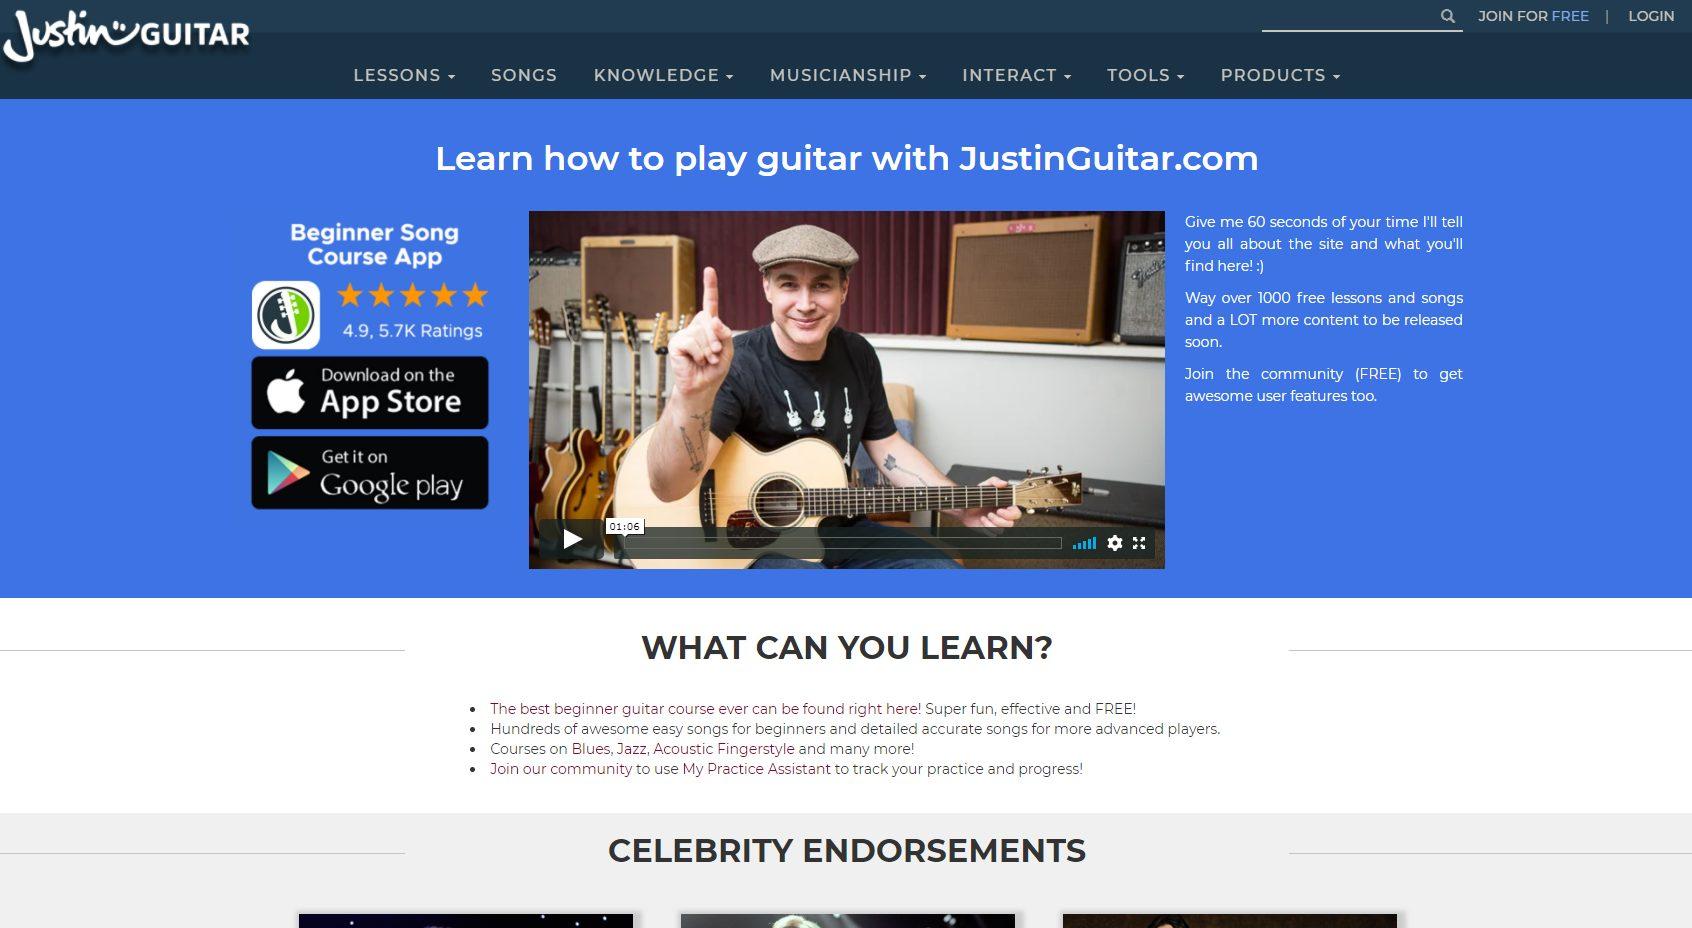 Justinguitar Home Page - October 2020